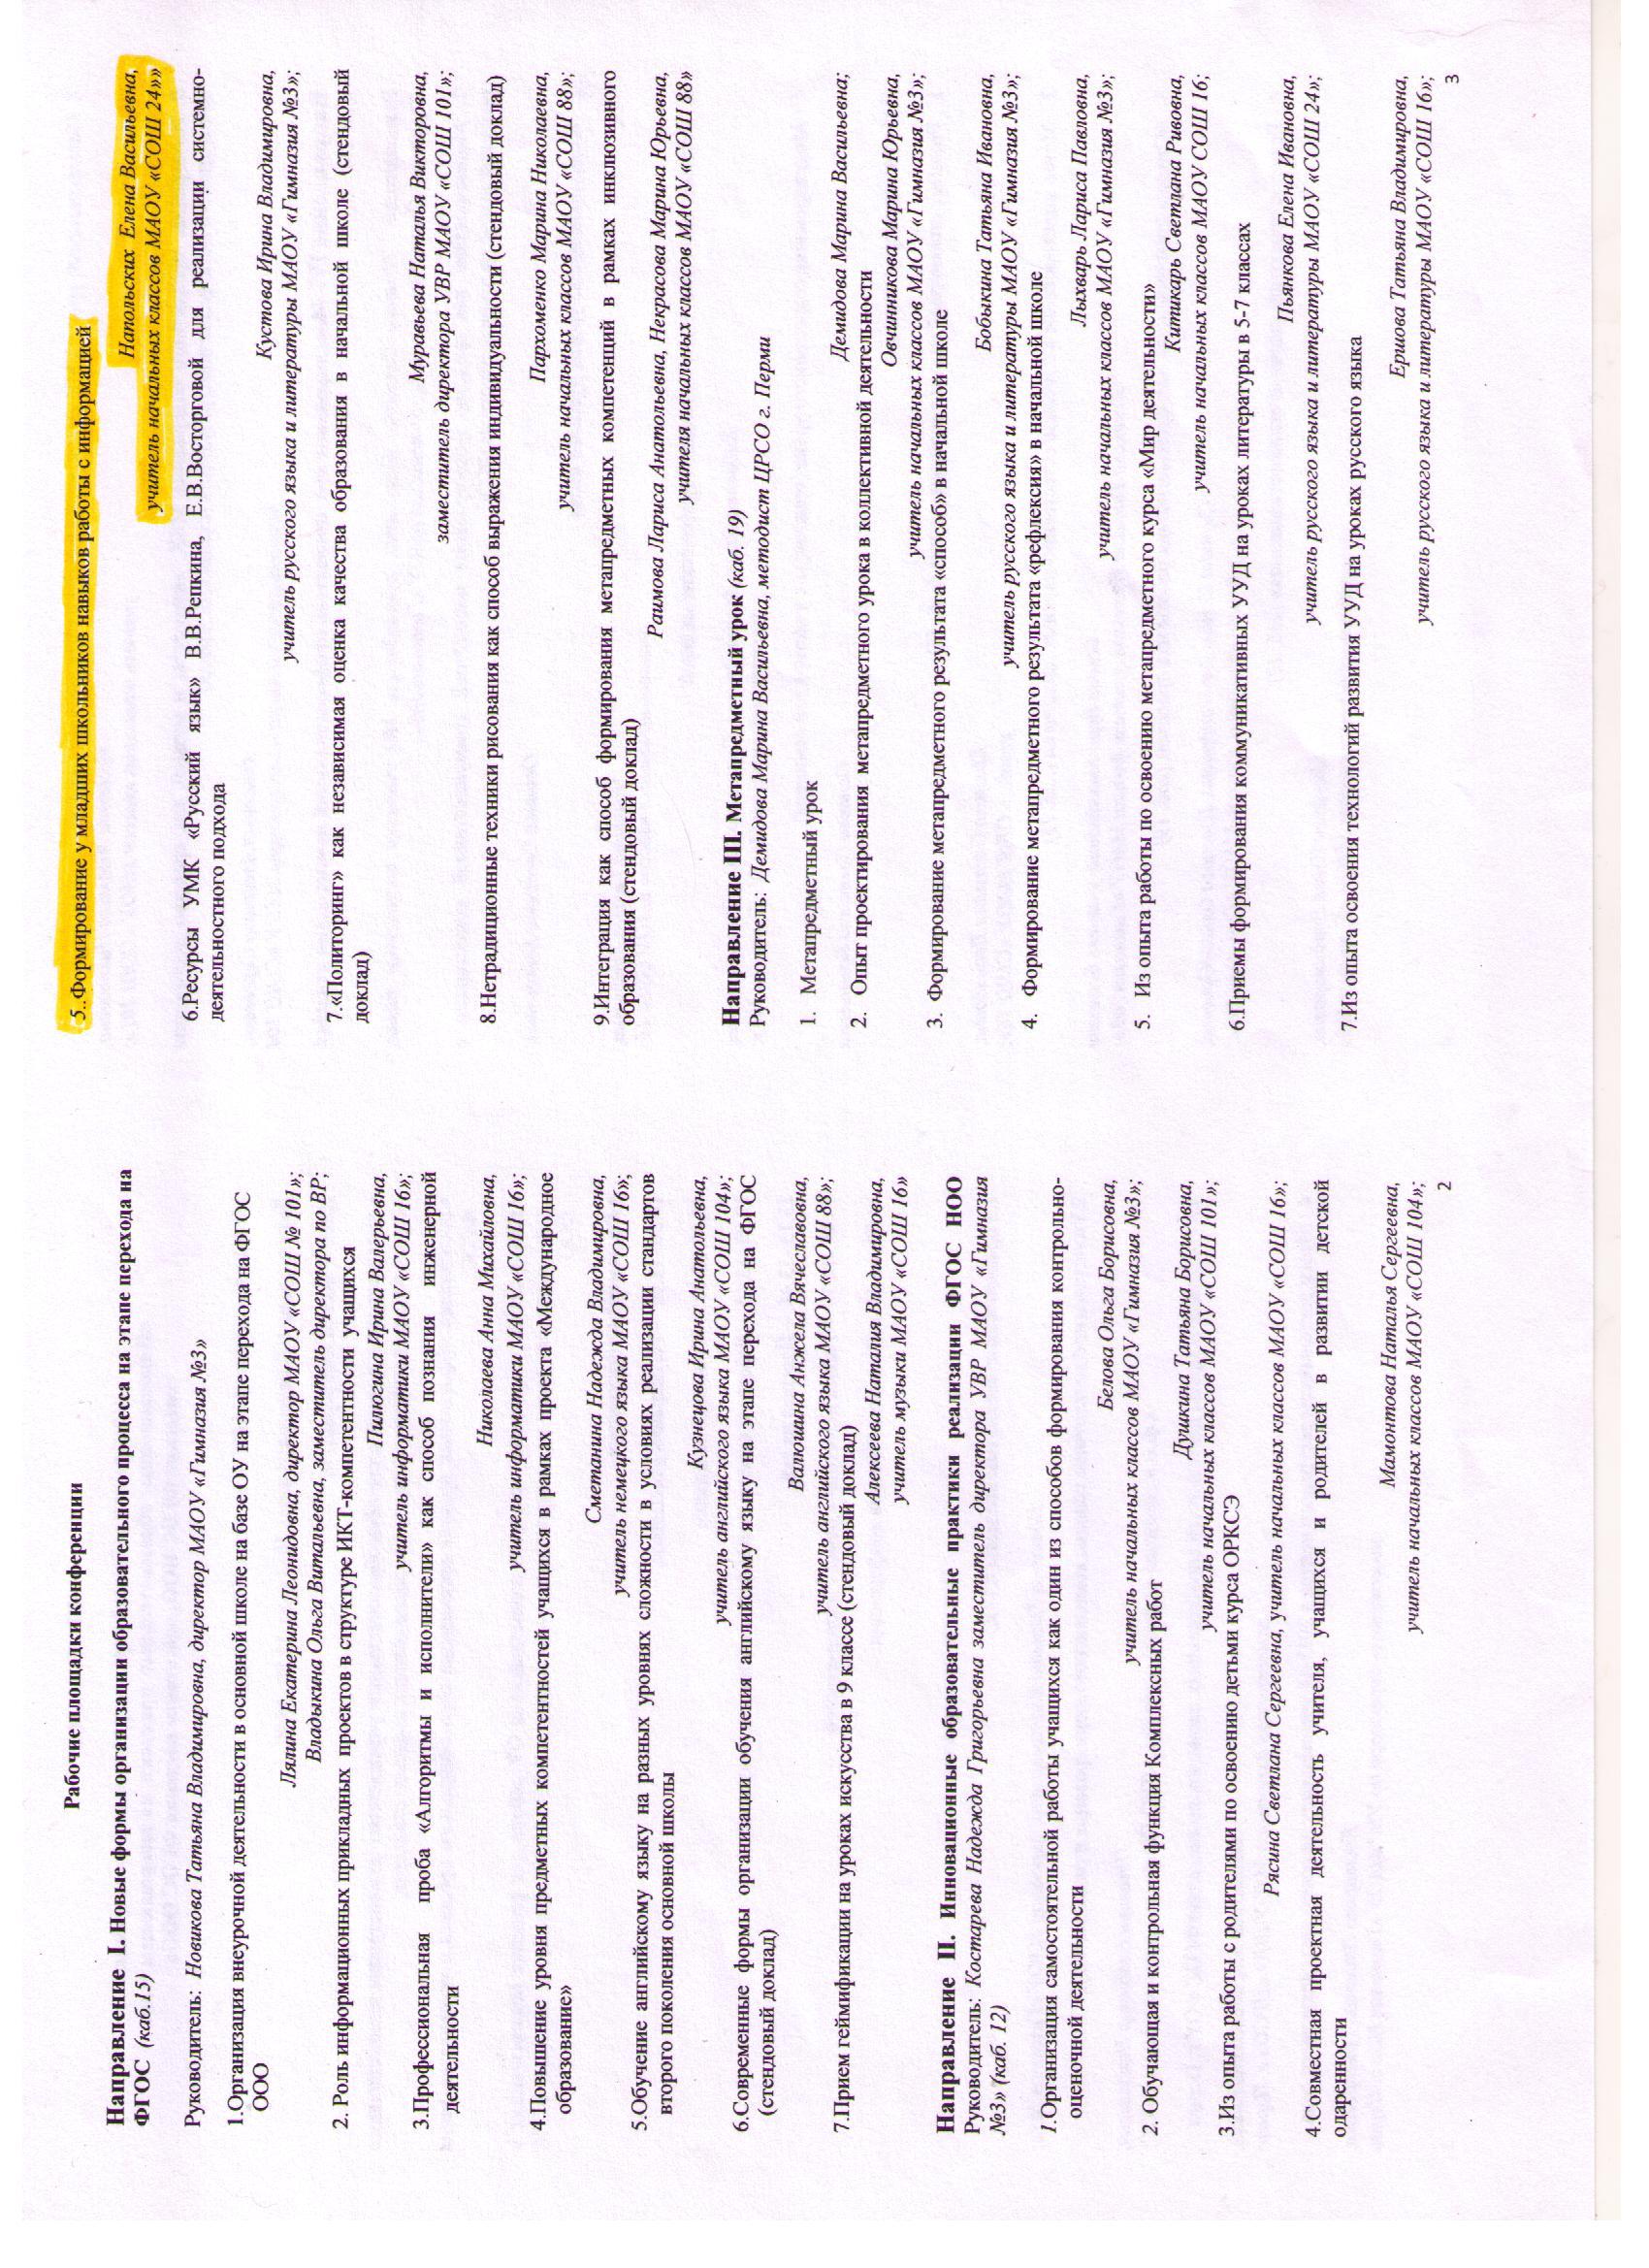 C:\Users\я\Documents\Scanned Documents\Рисунок (4).jpg